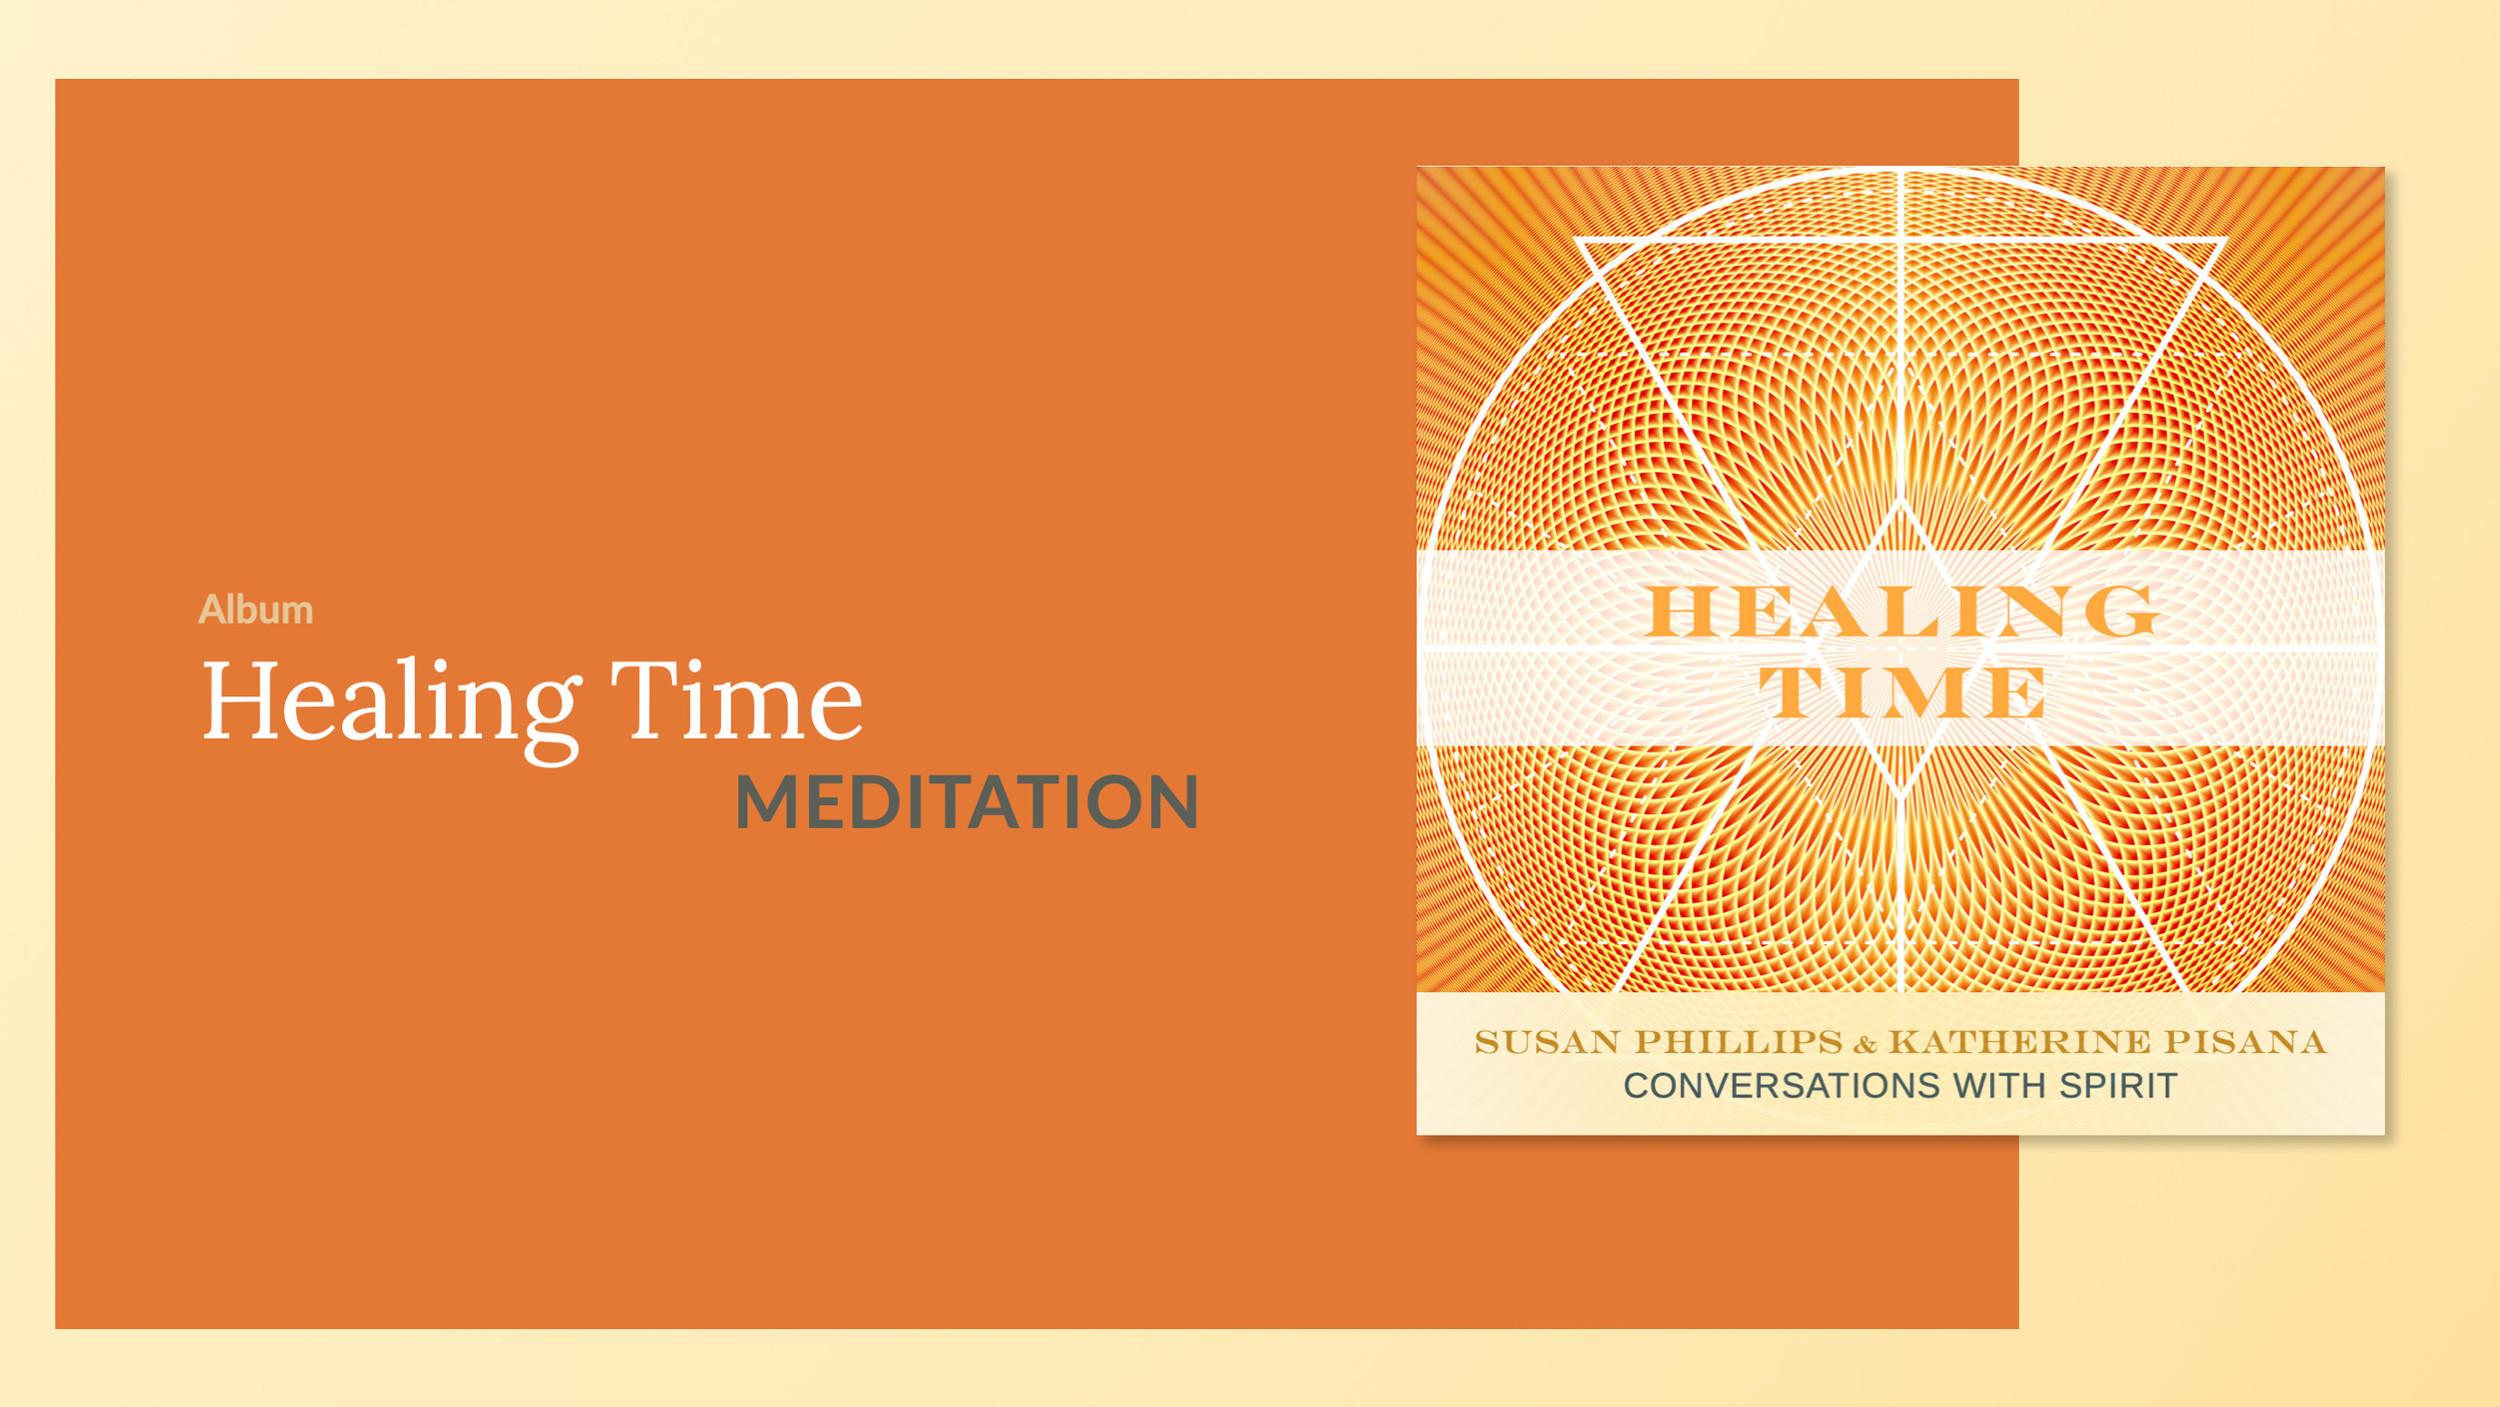 Healing Time Meditation